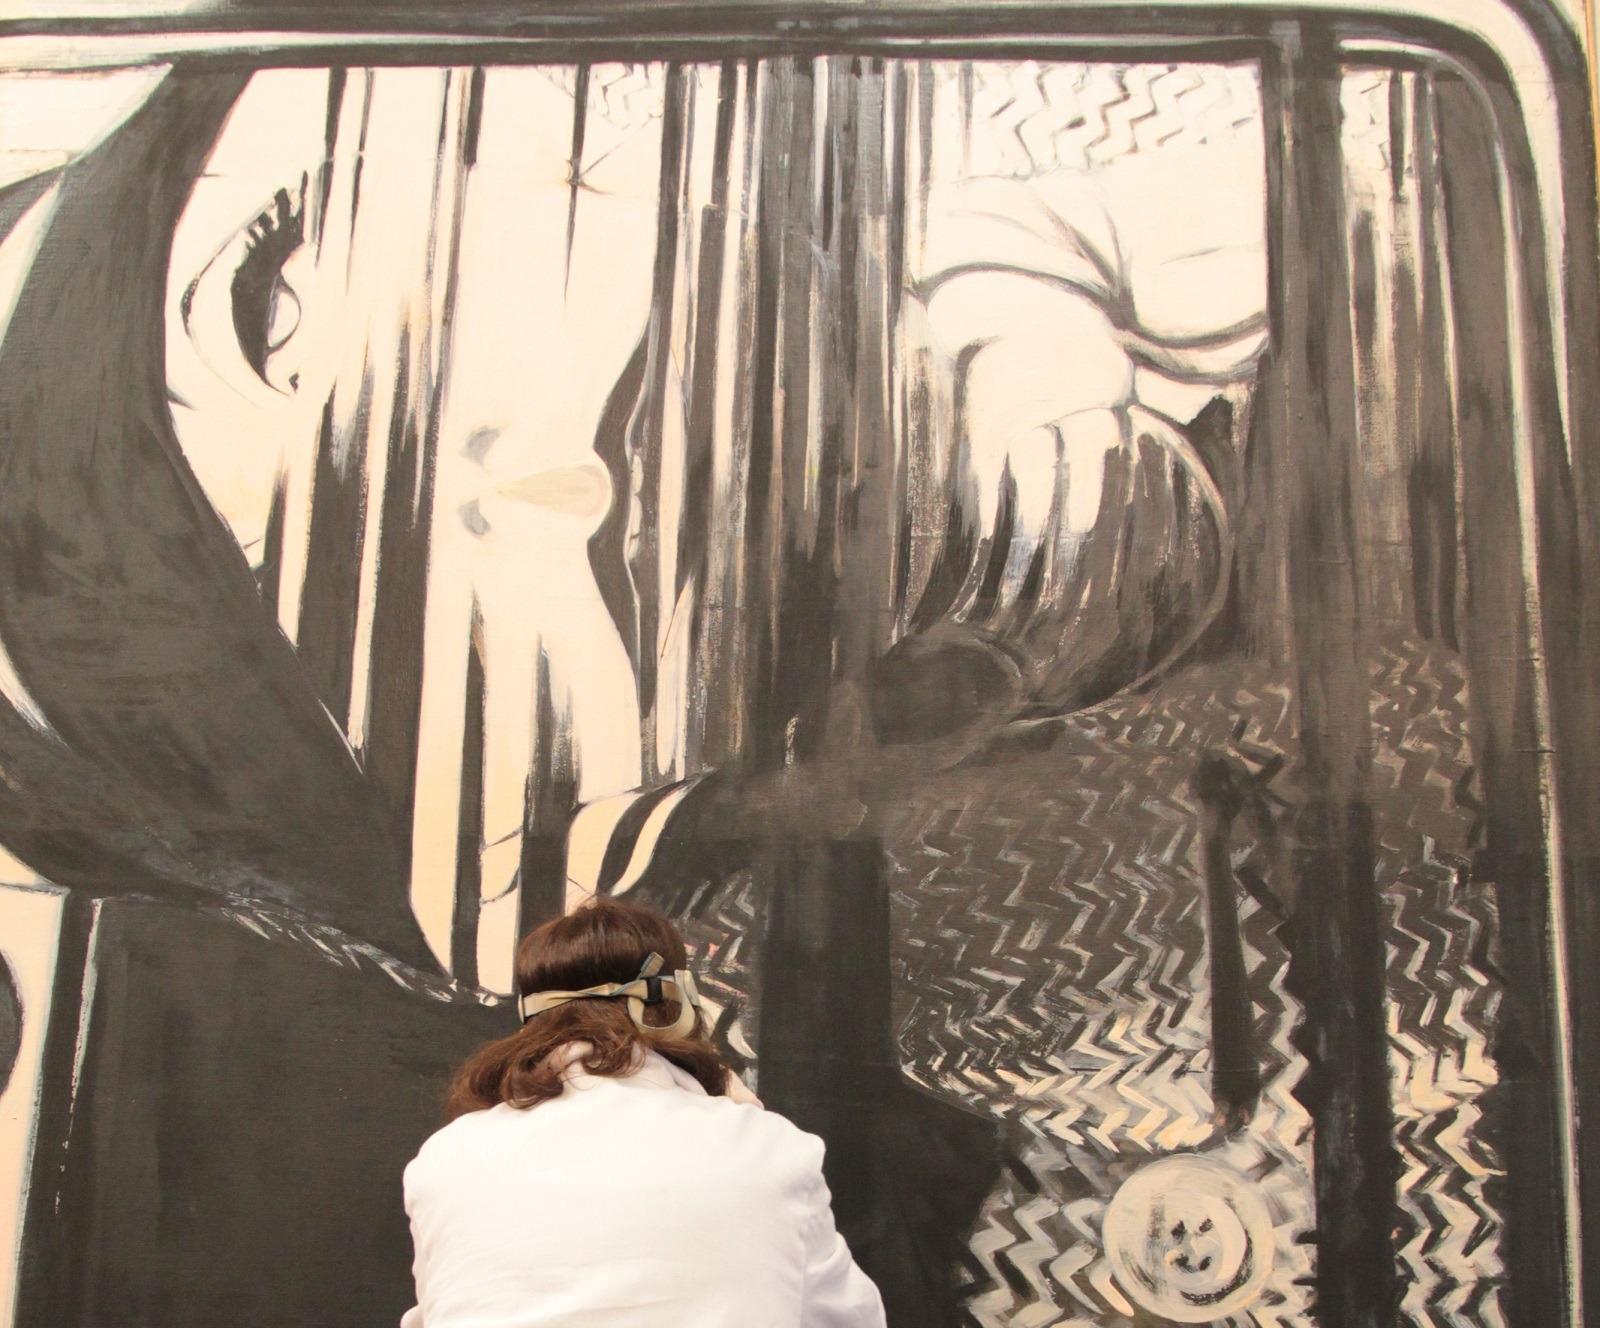 Rossella Lari restoring Greta Garbo